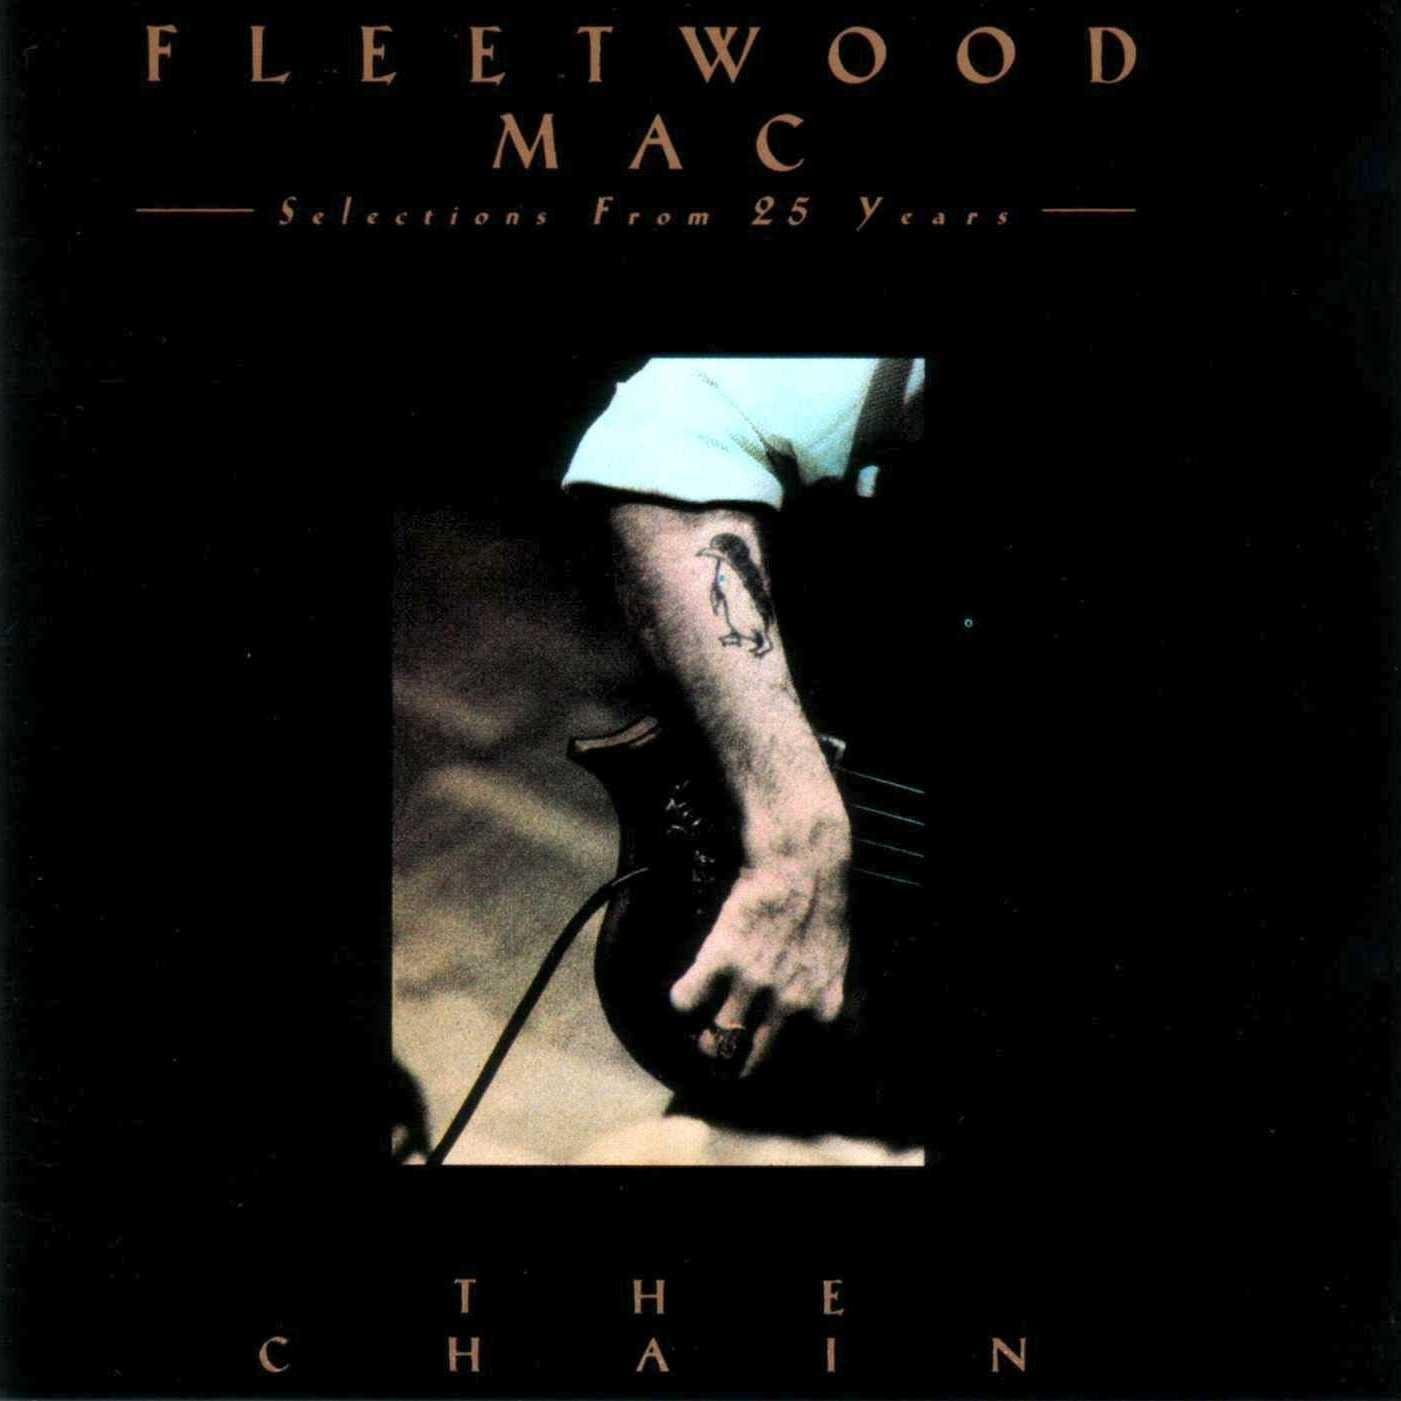 Fleetwood Mac 25 Years The Chain 4 Cd Dubman Home